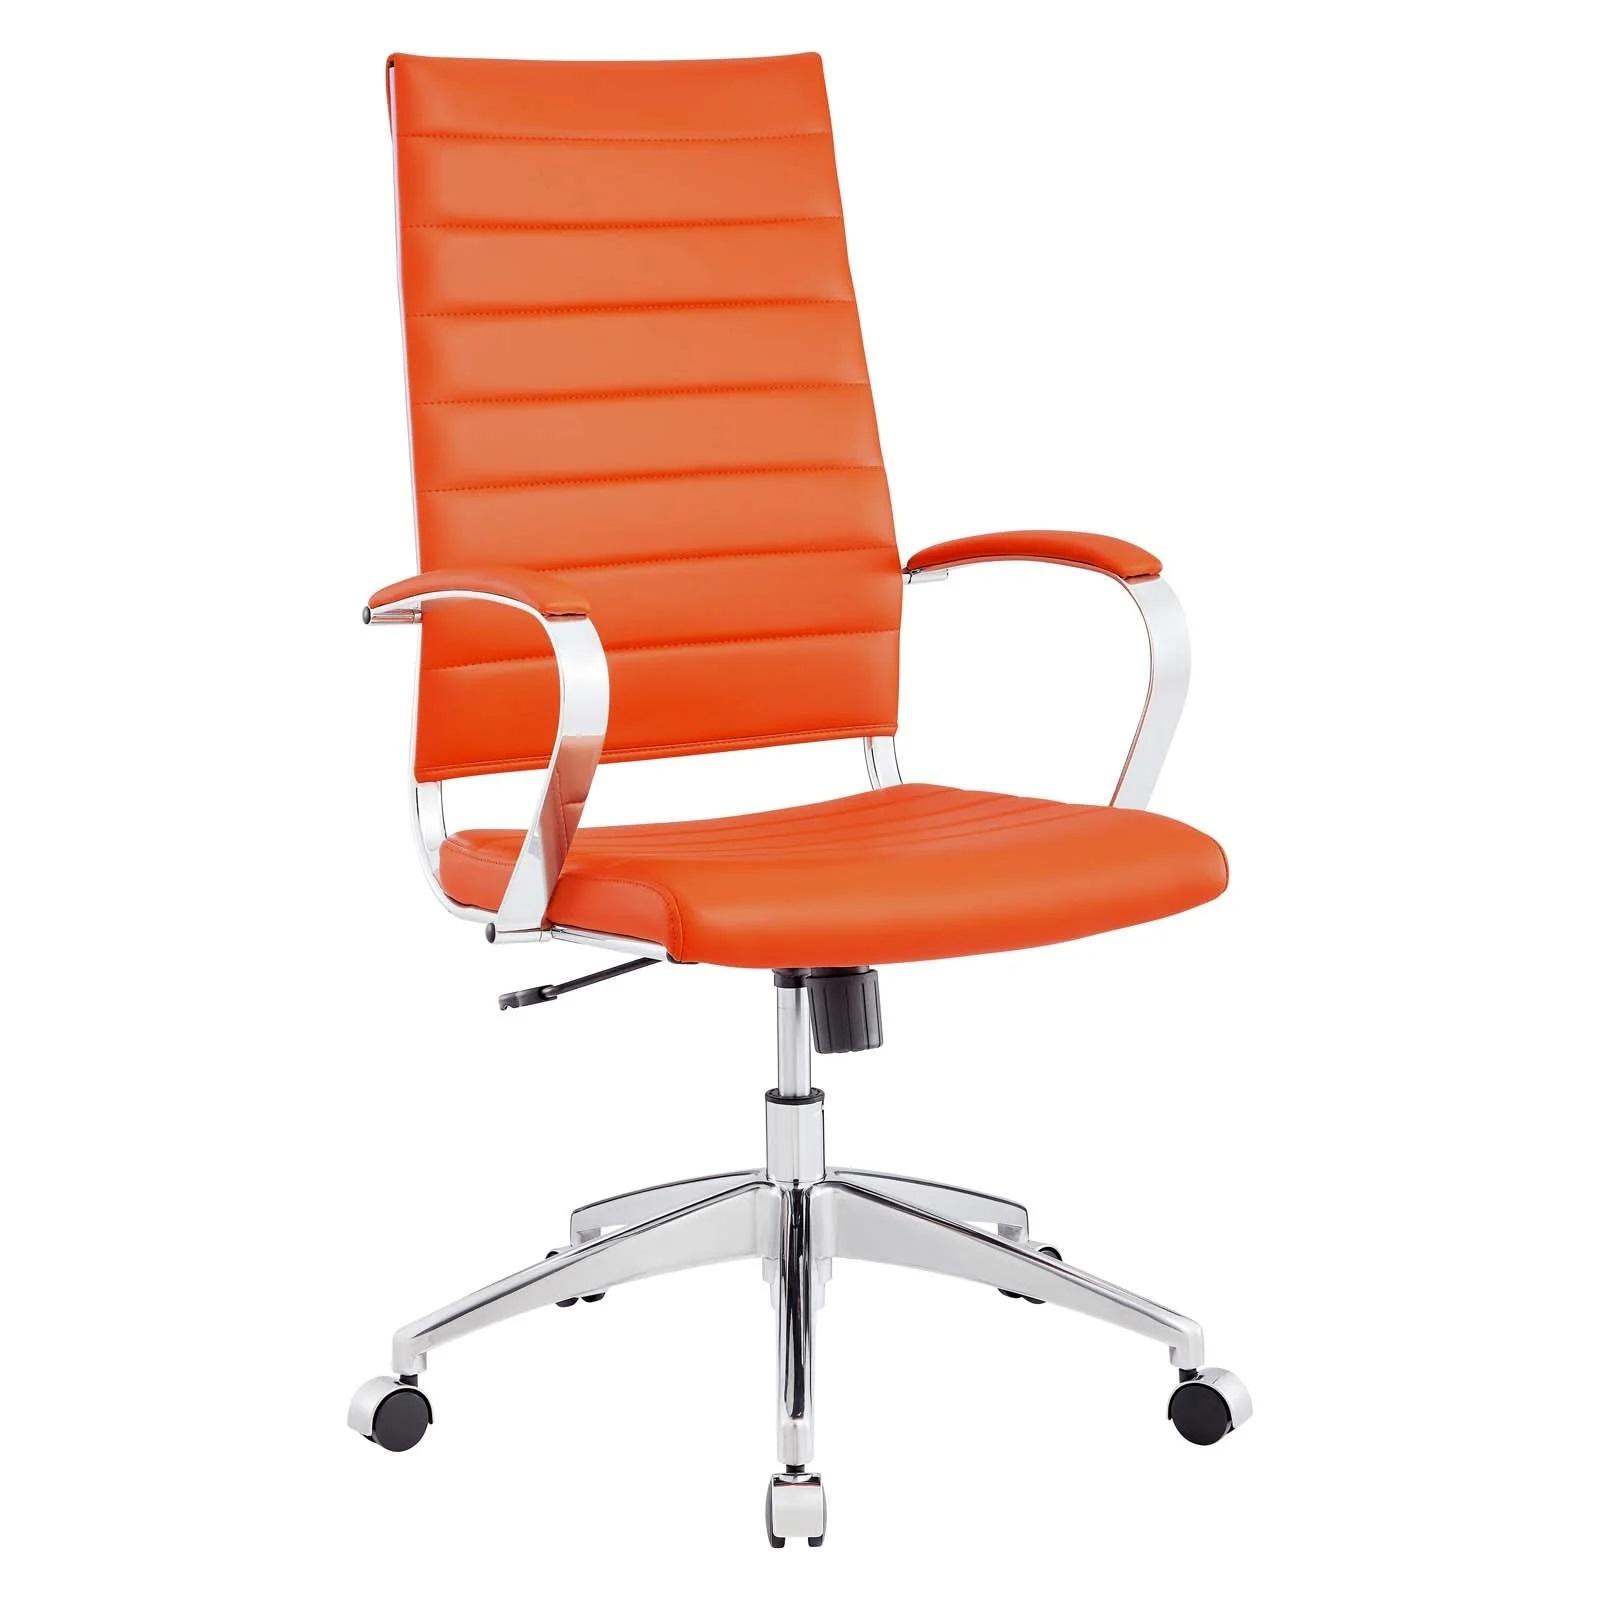 Highback Office Chair in Orange